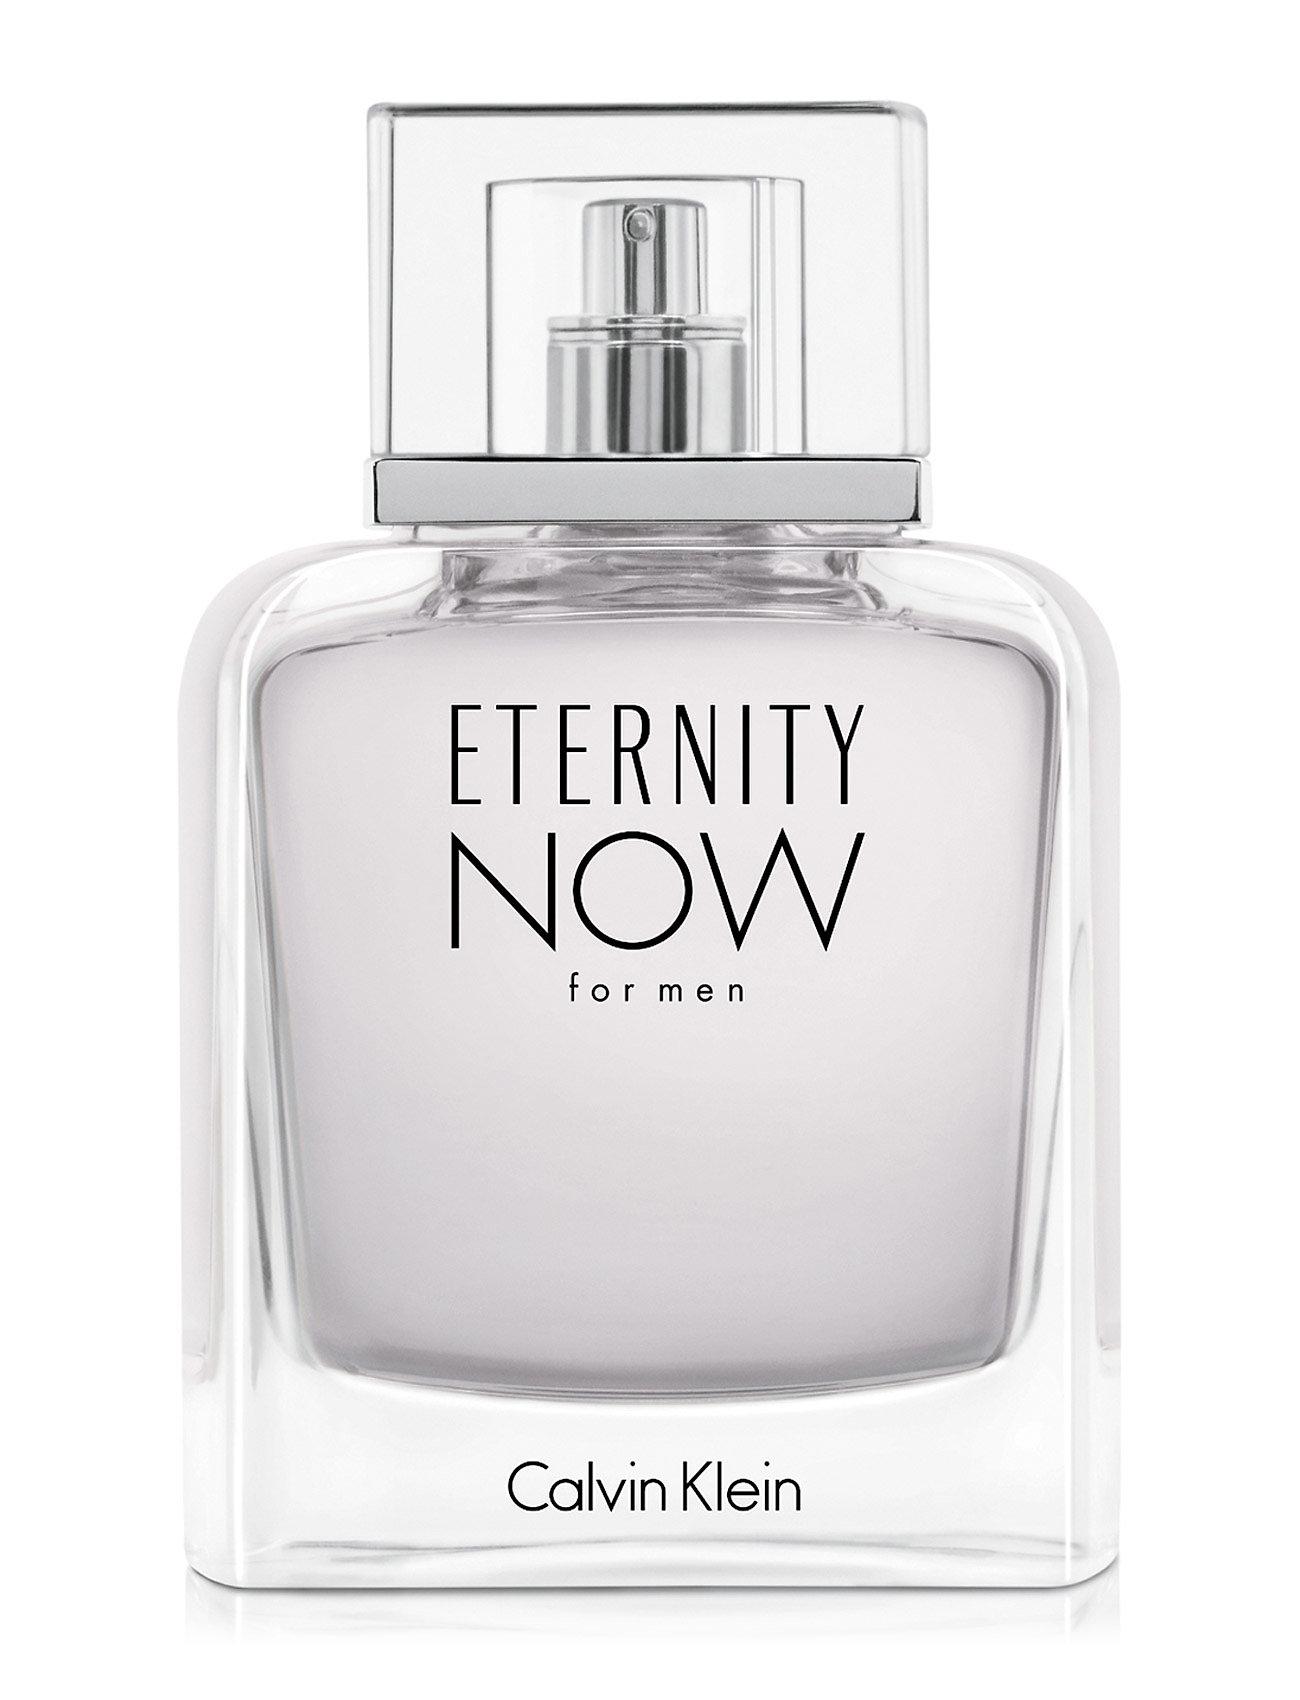 Calvin klein eternity man now eau d fra calvin klein fragrance fra boozt.com dk